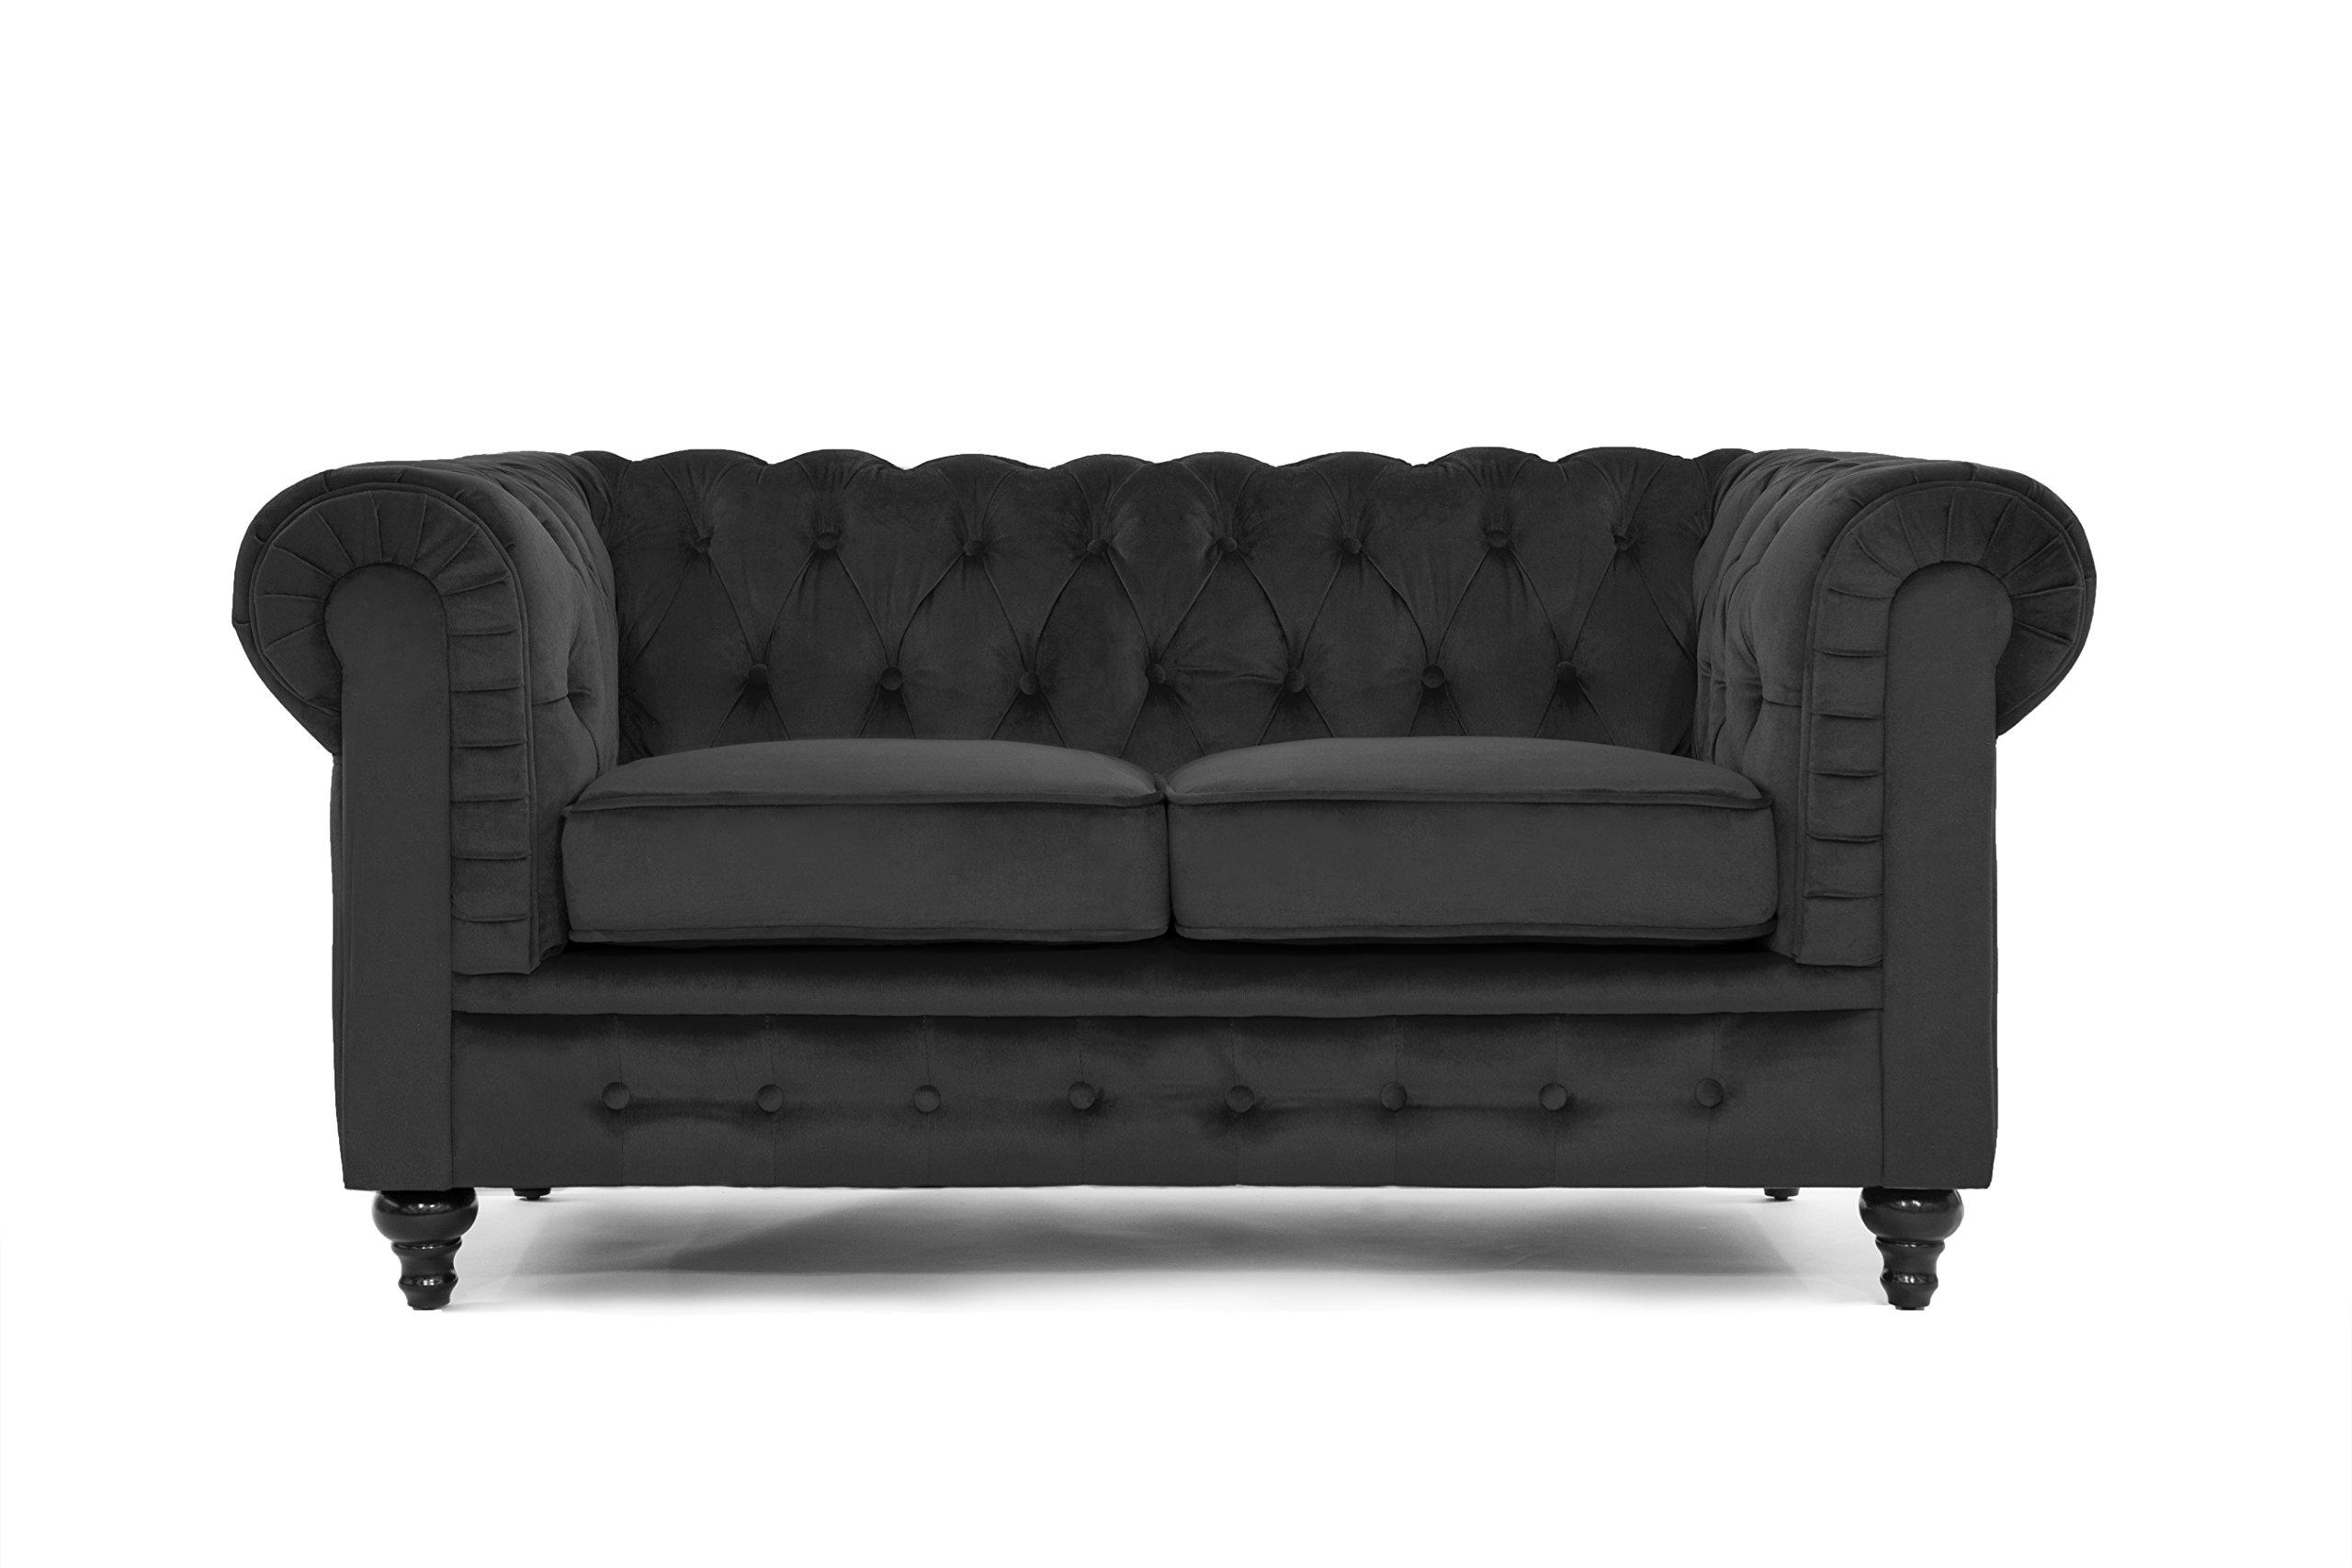 Classic Modern Scroll Arm Velvet large Love Seat Sofa in Colors Purple, Red, Black, Grey (Black)